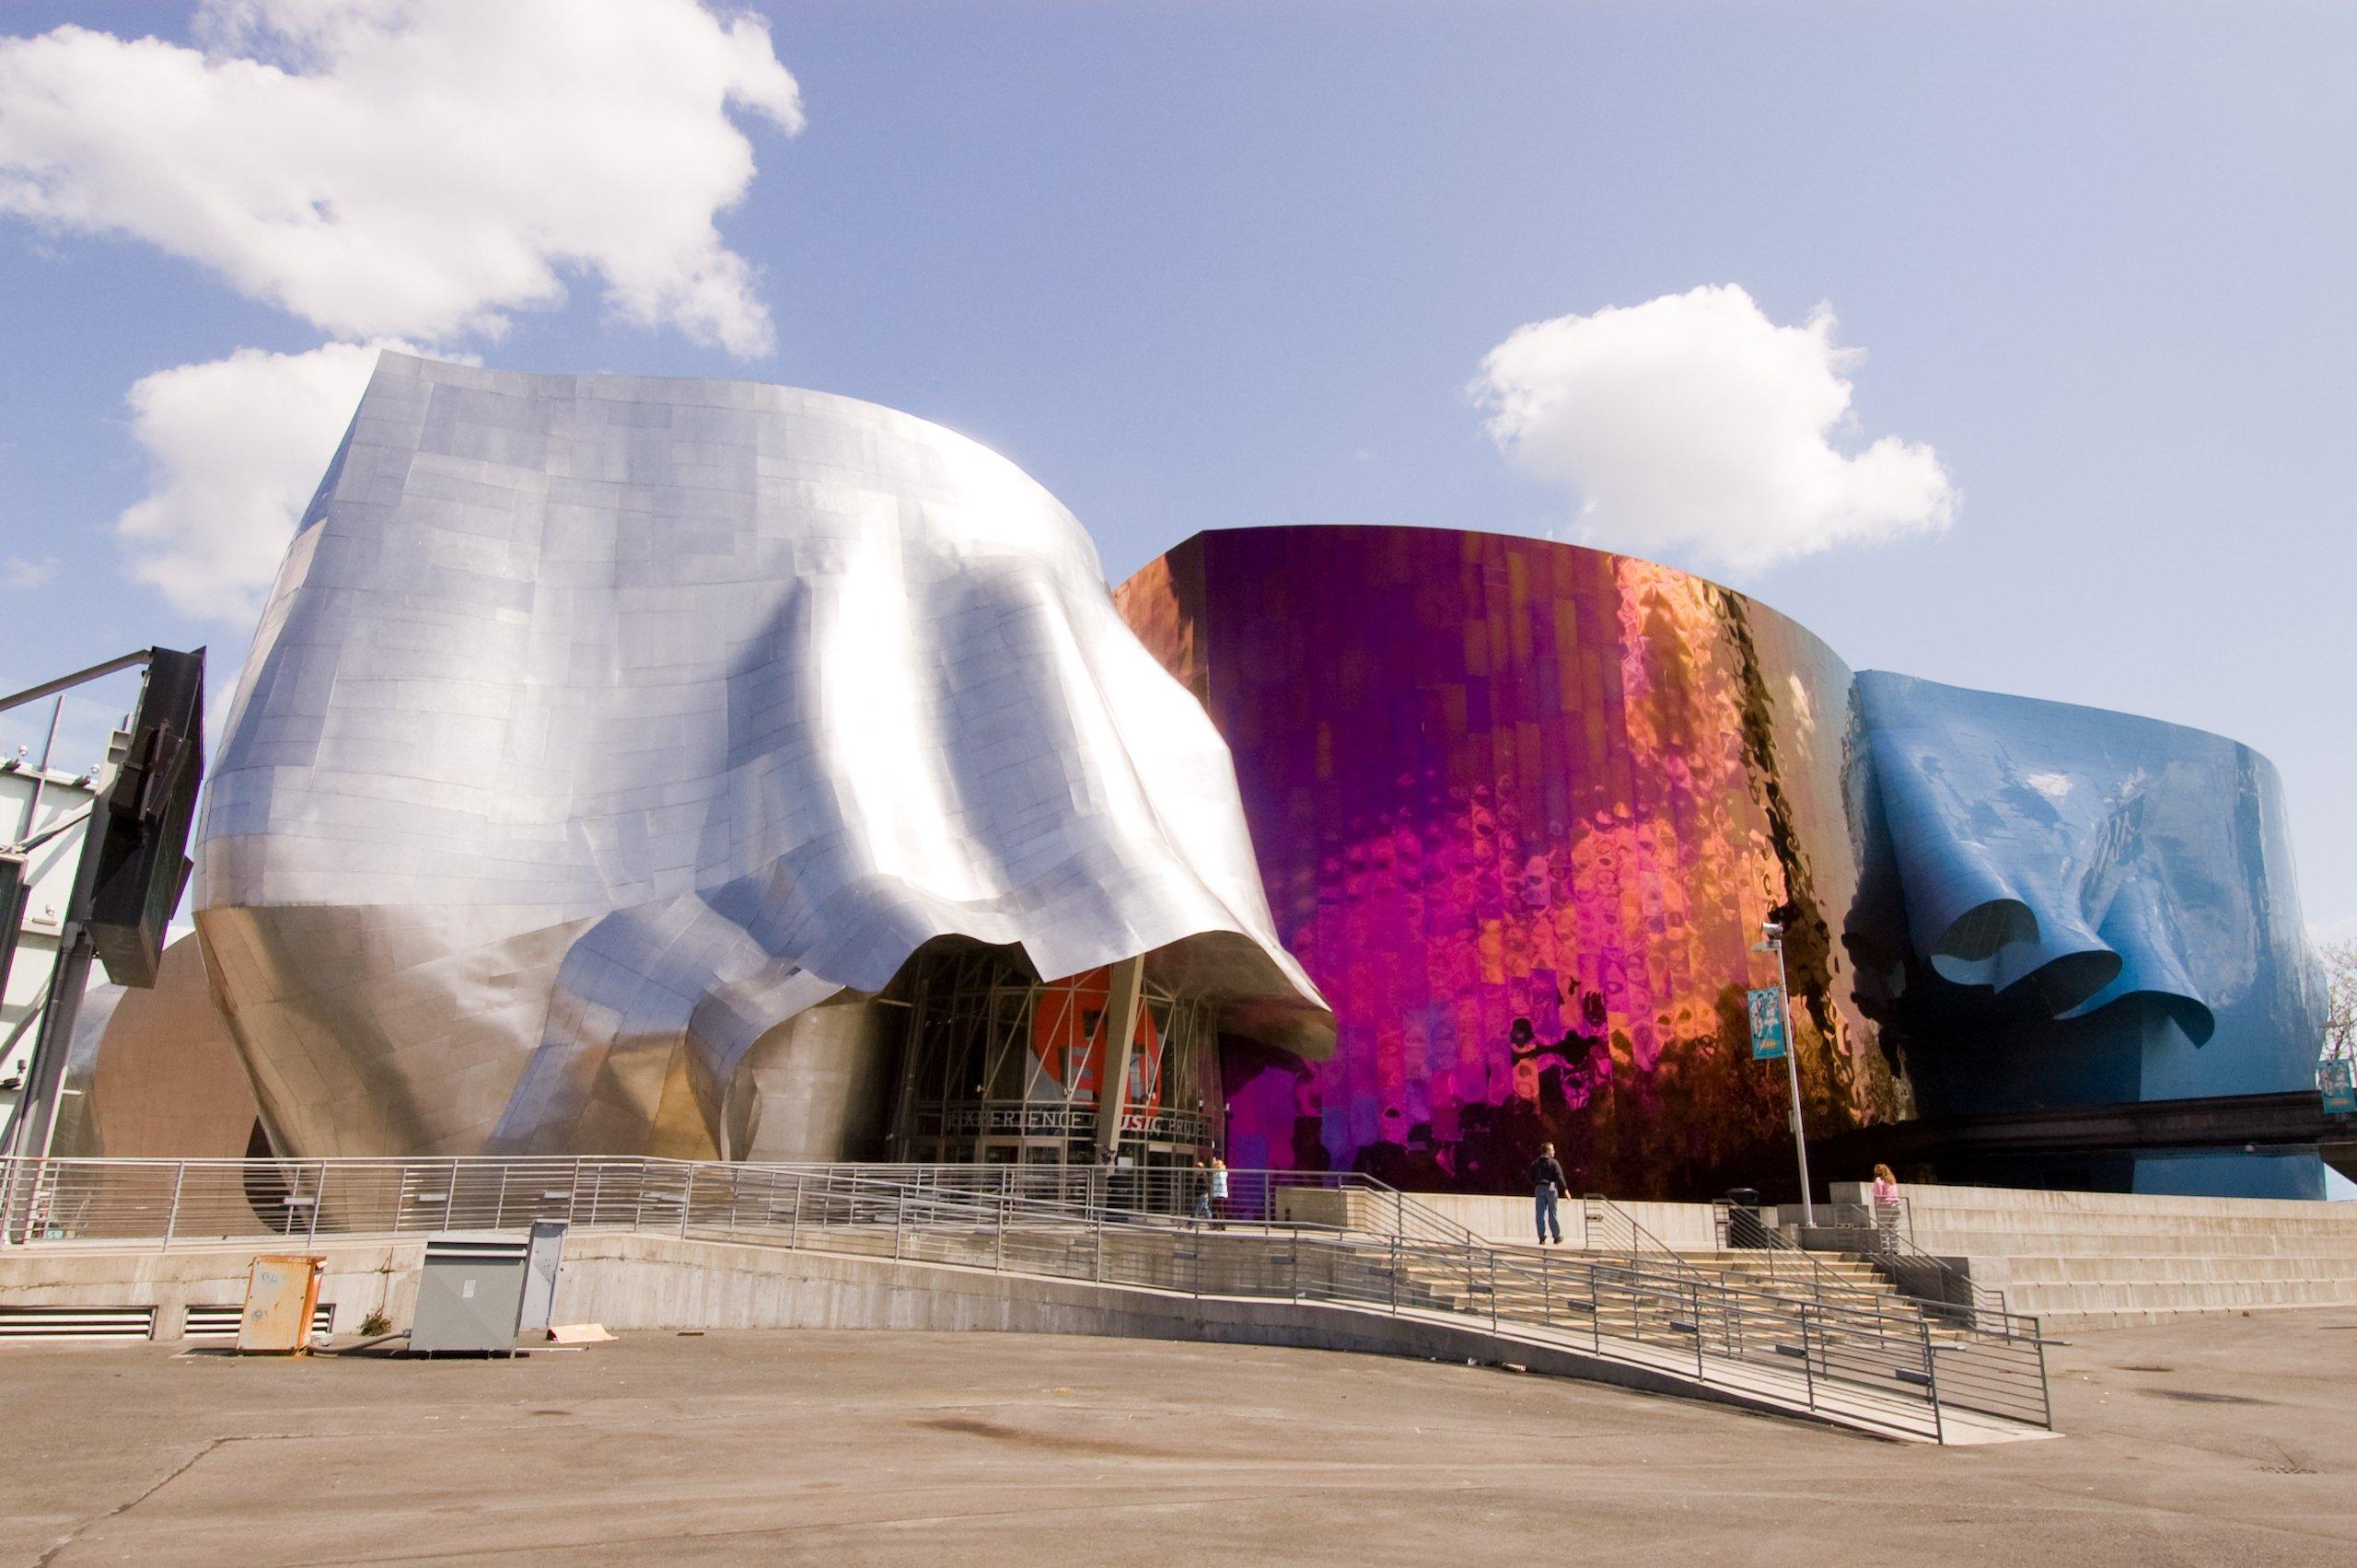 Architecture - EMP Museum, a.k.a. Museum of Pop Culture, Seattle, WA